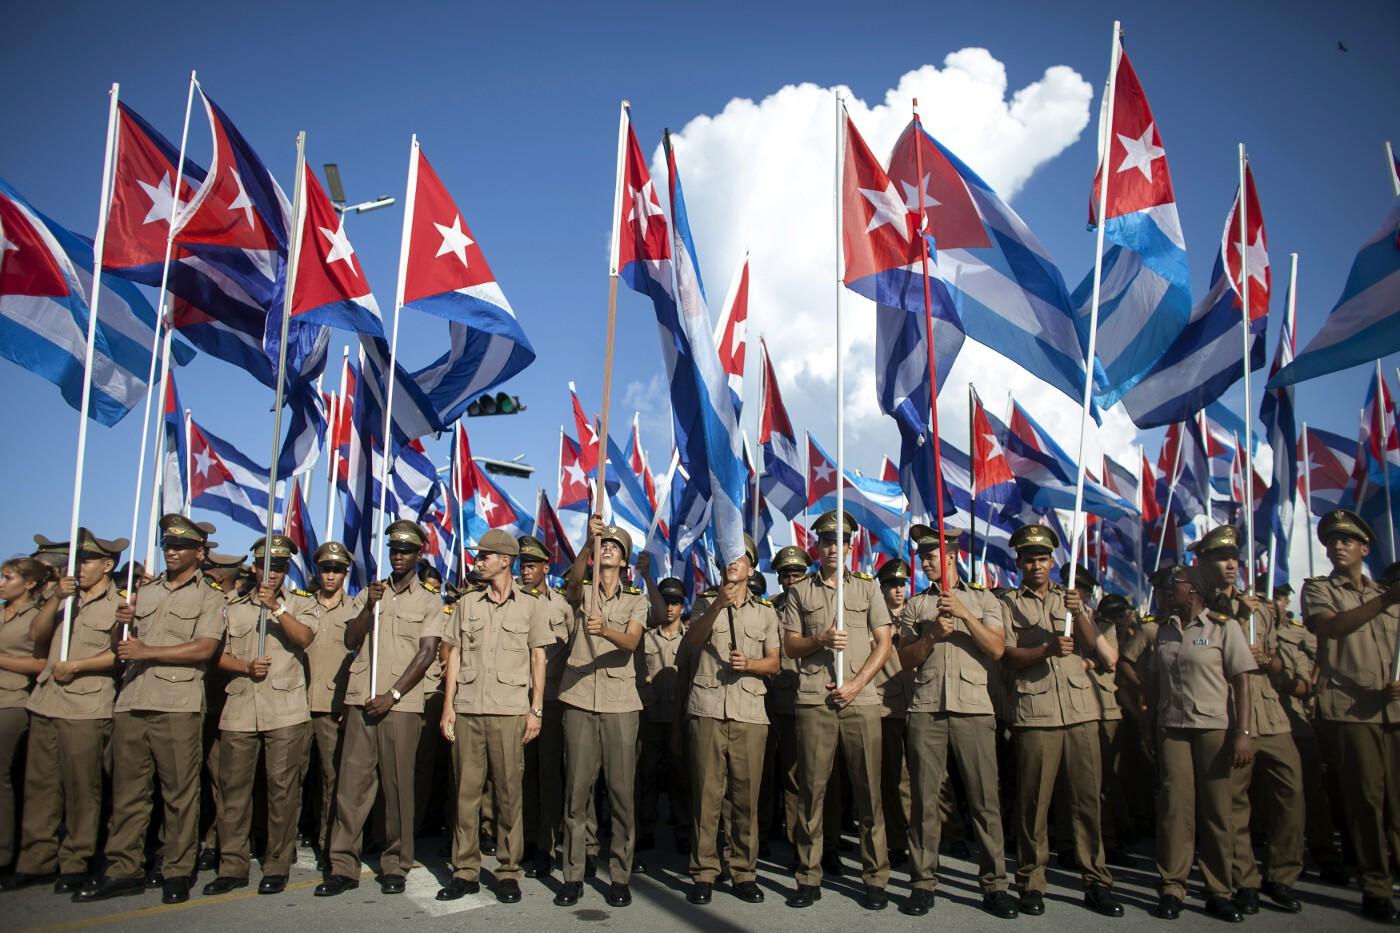 Life in Cuba 2